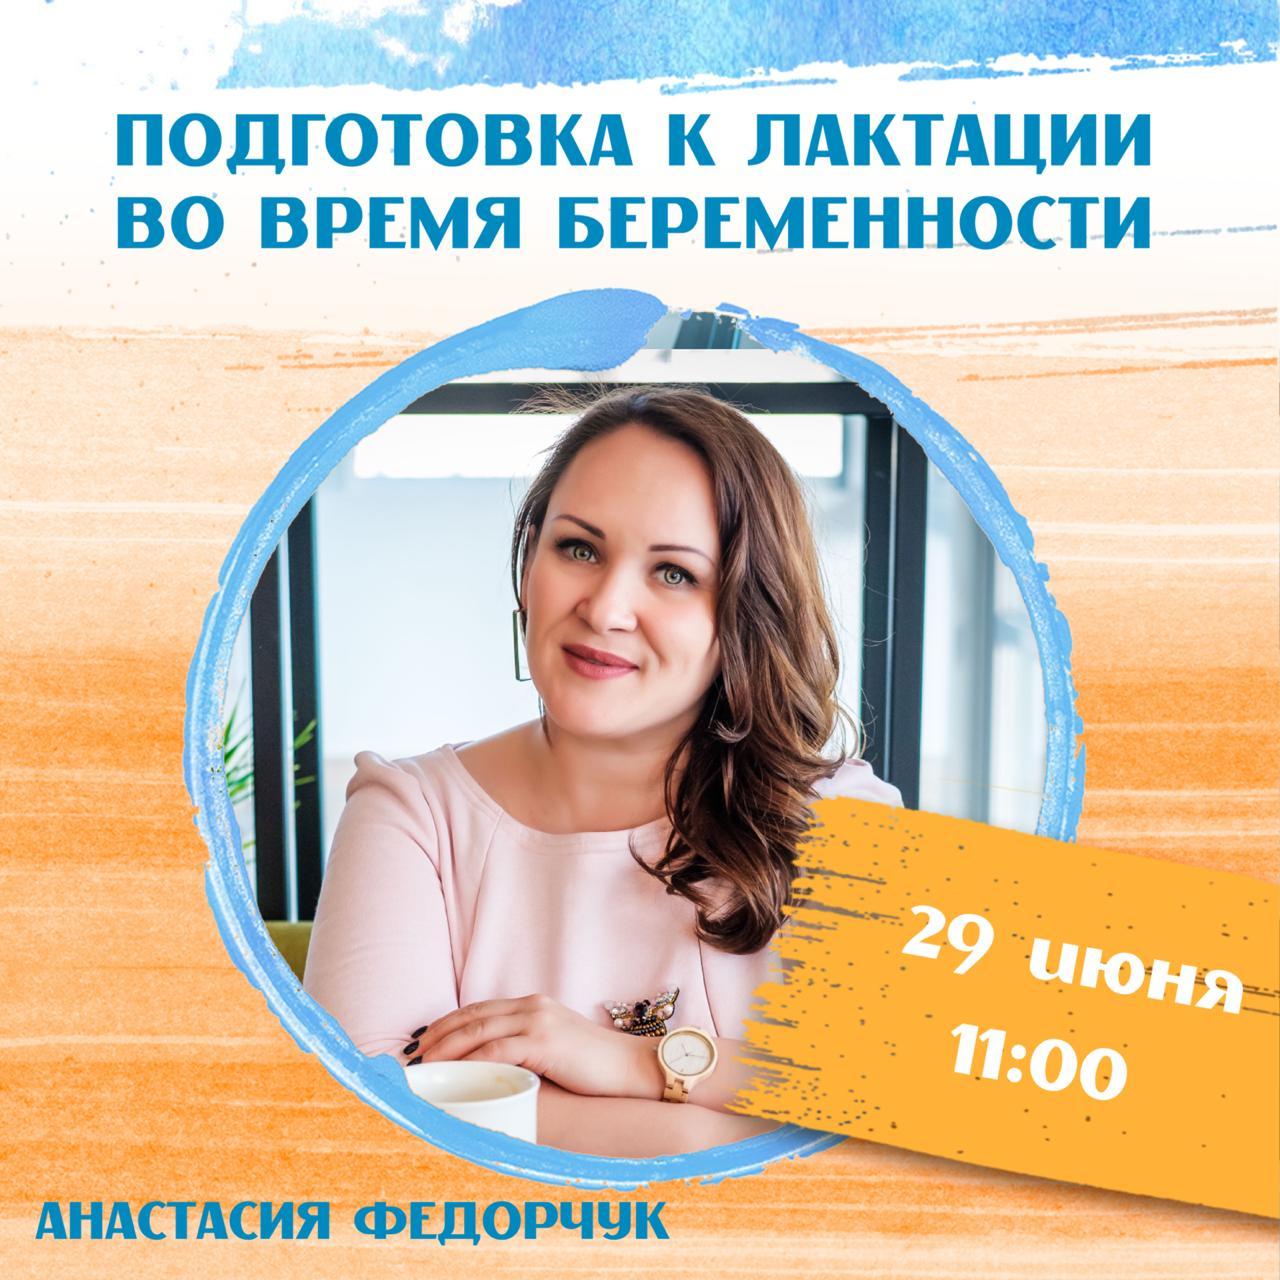 Федорчук